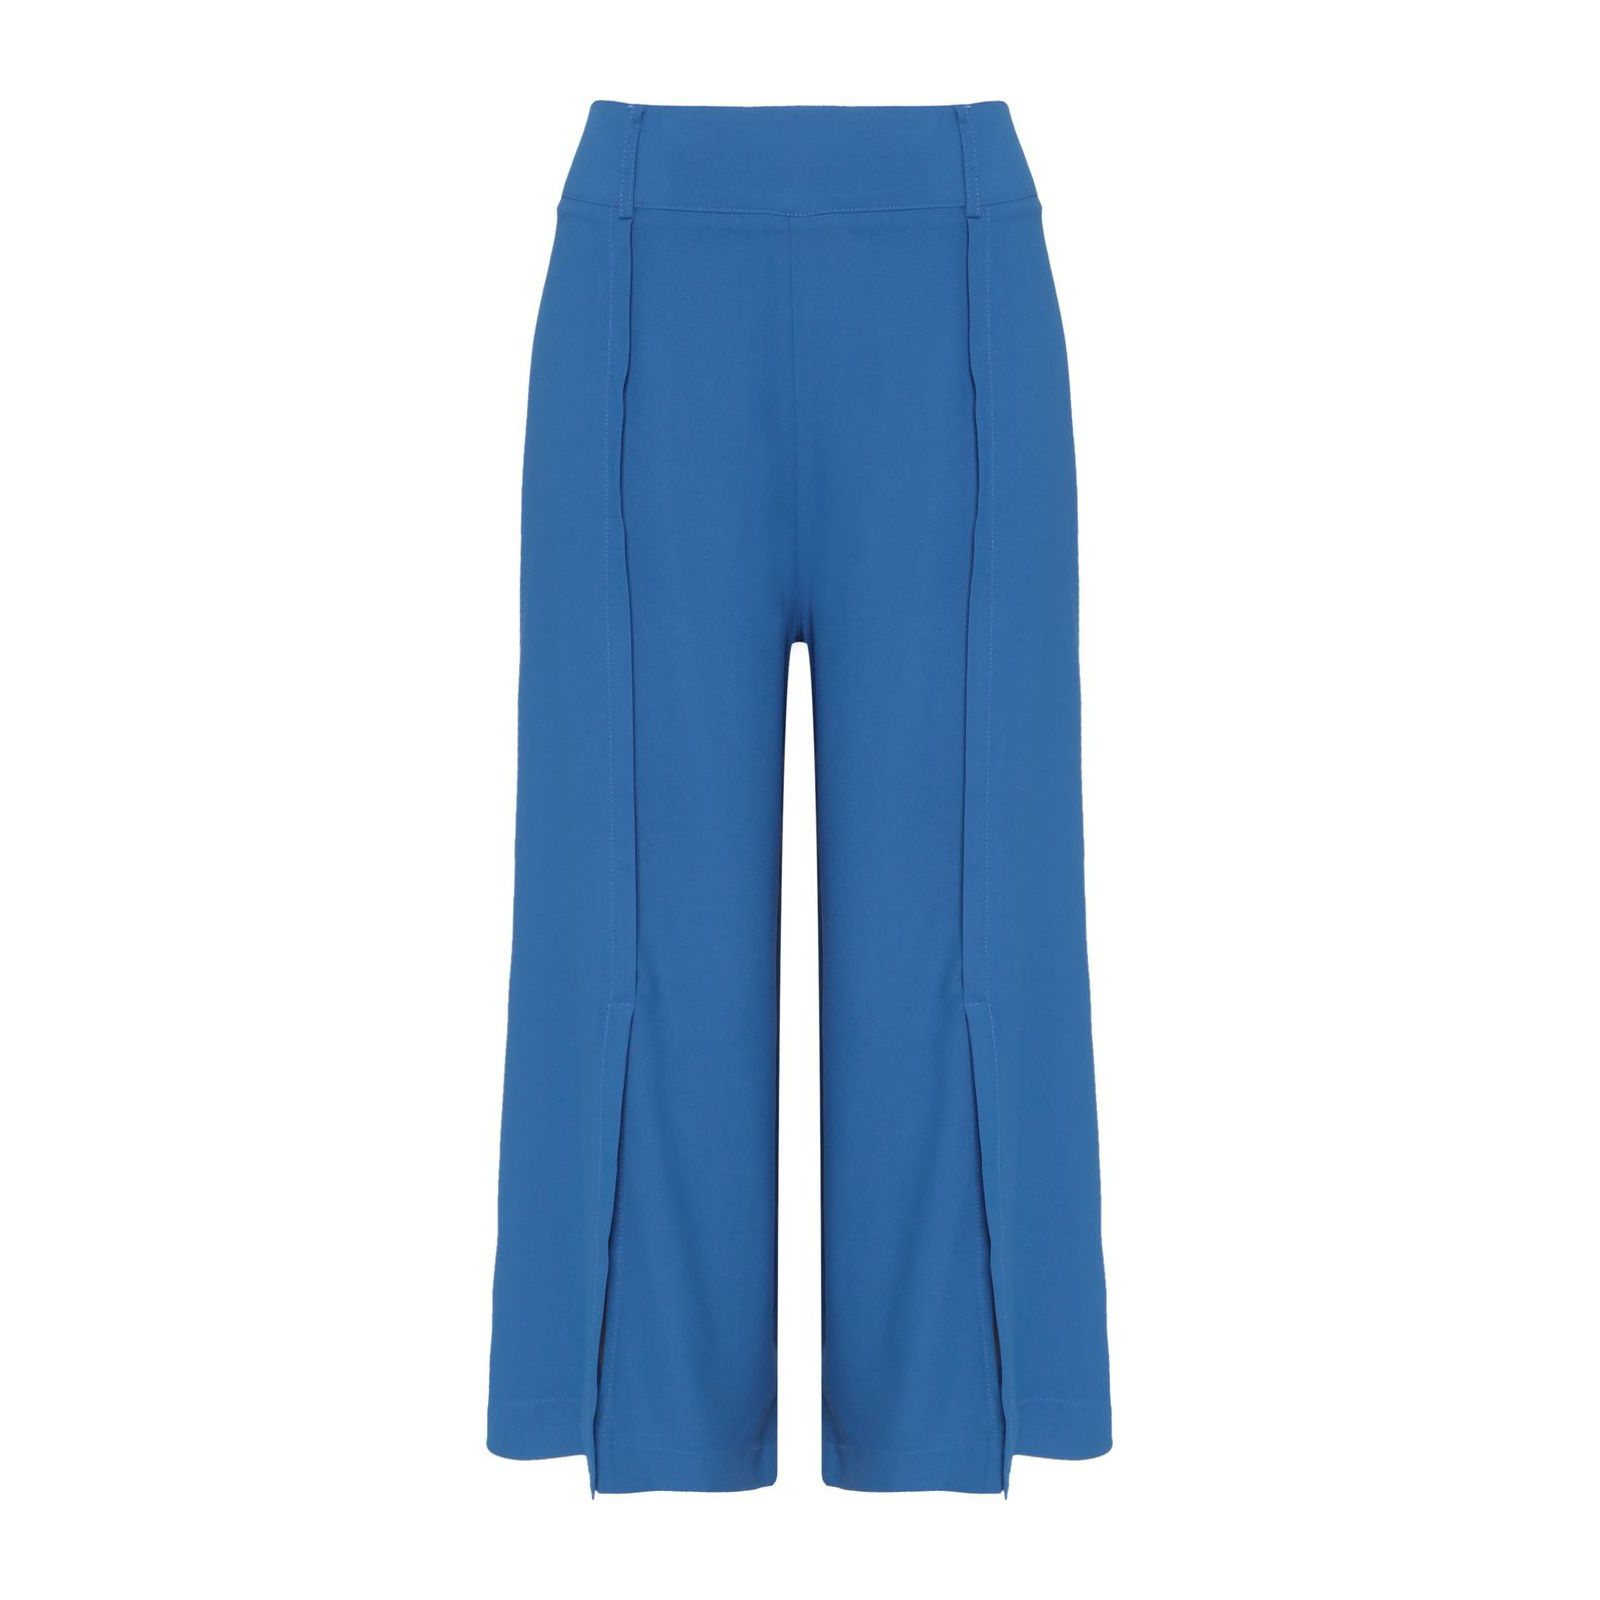 Calça Pantacourt Ma - Azul